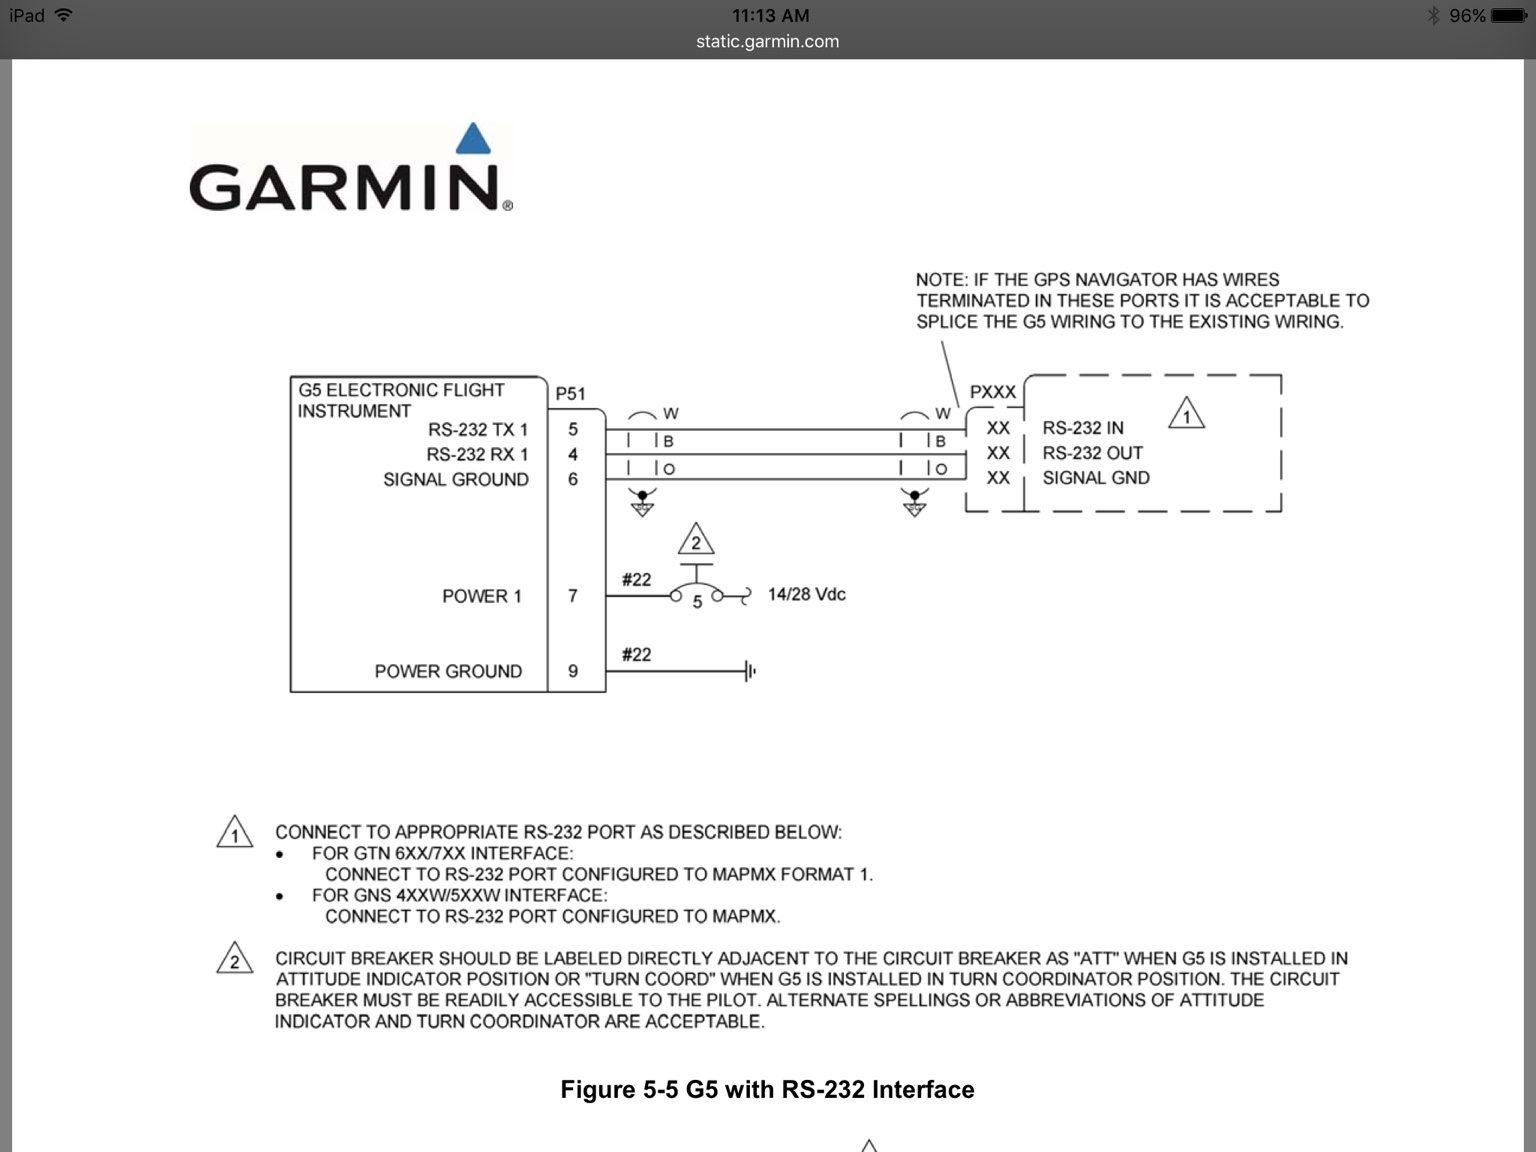 Garmin Fishfinder 160c Wiring Diagram - garmin wiring ... on